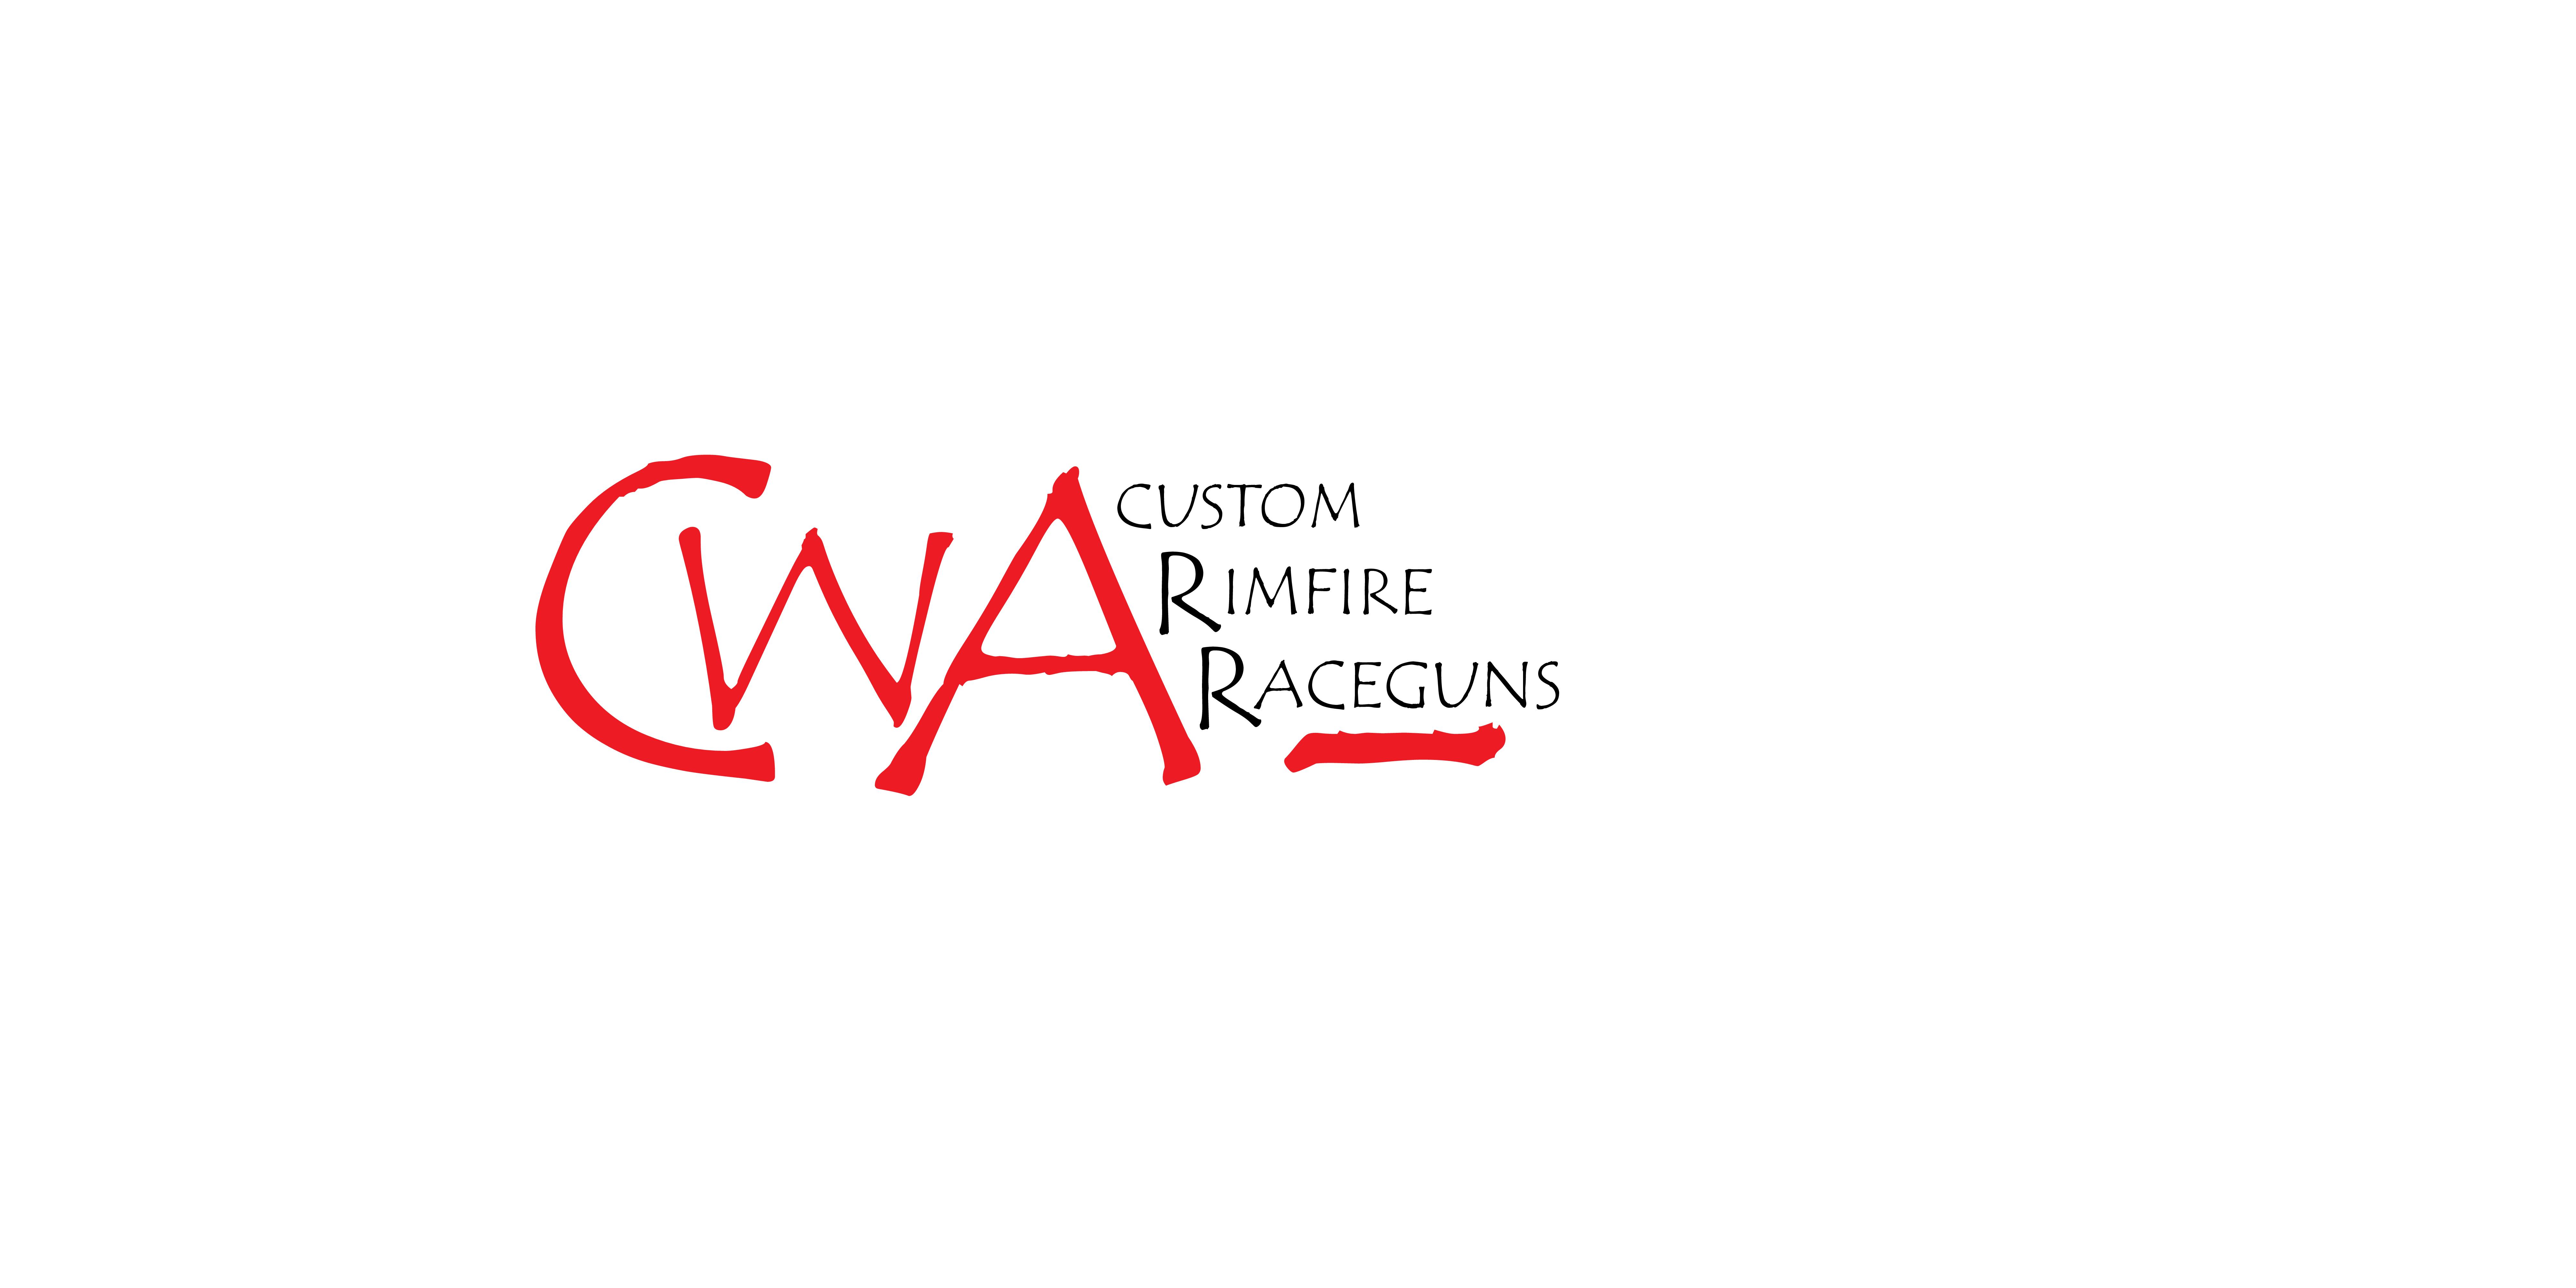 CWA-custom-raceguns